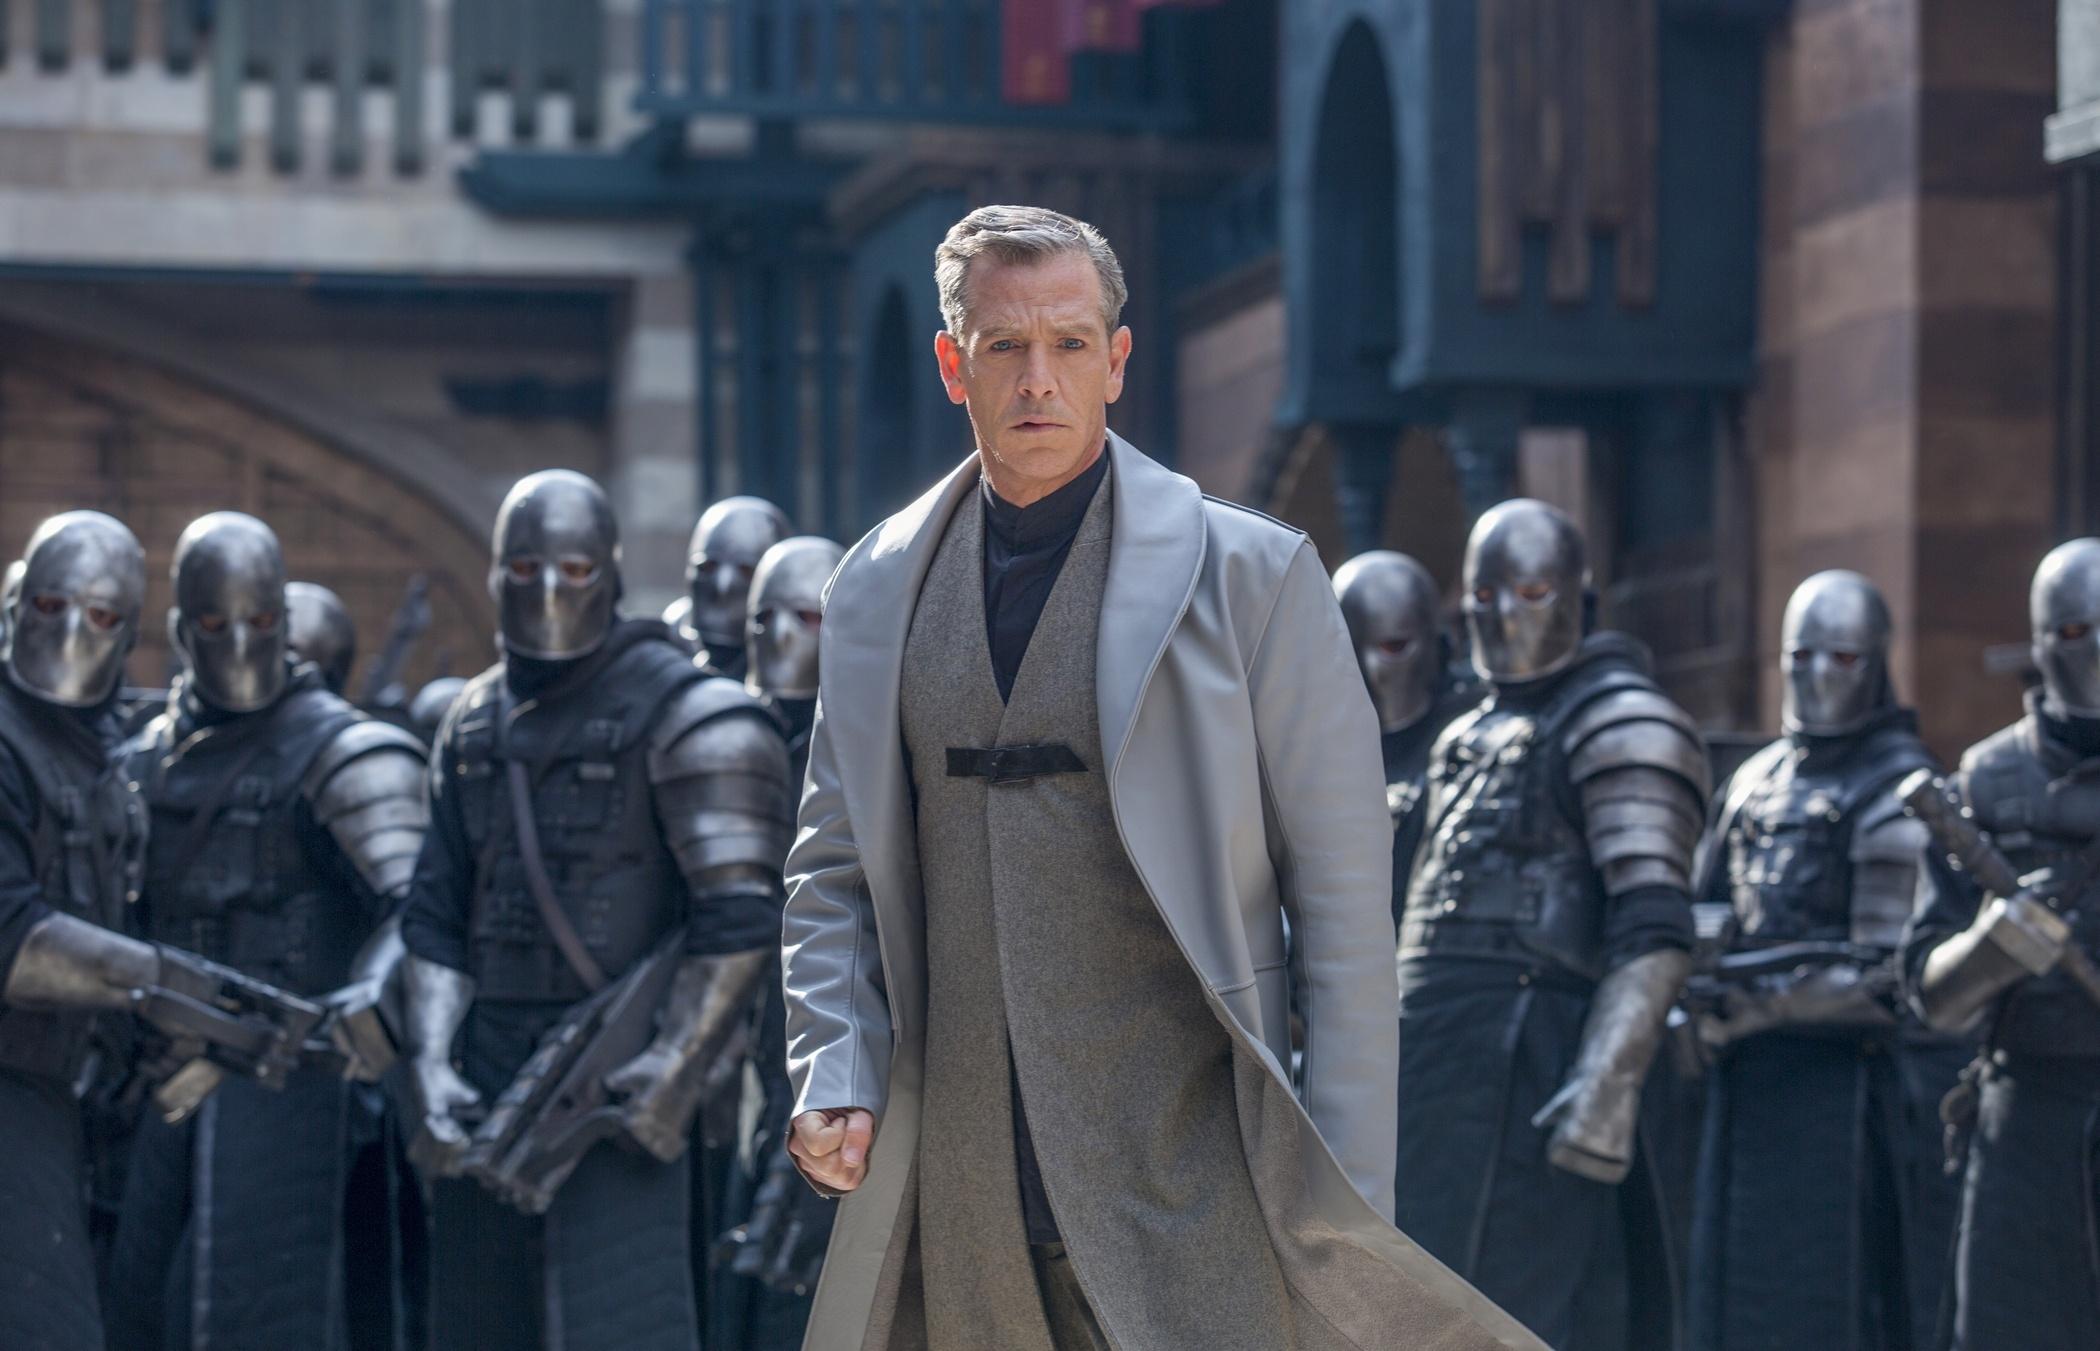 'Robin Hood', llega el teaser tráiler de esta nueva aventura con Taron Egerton • En tu pantalla